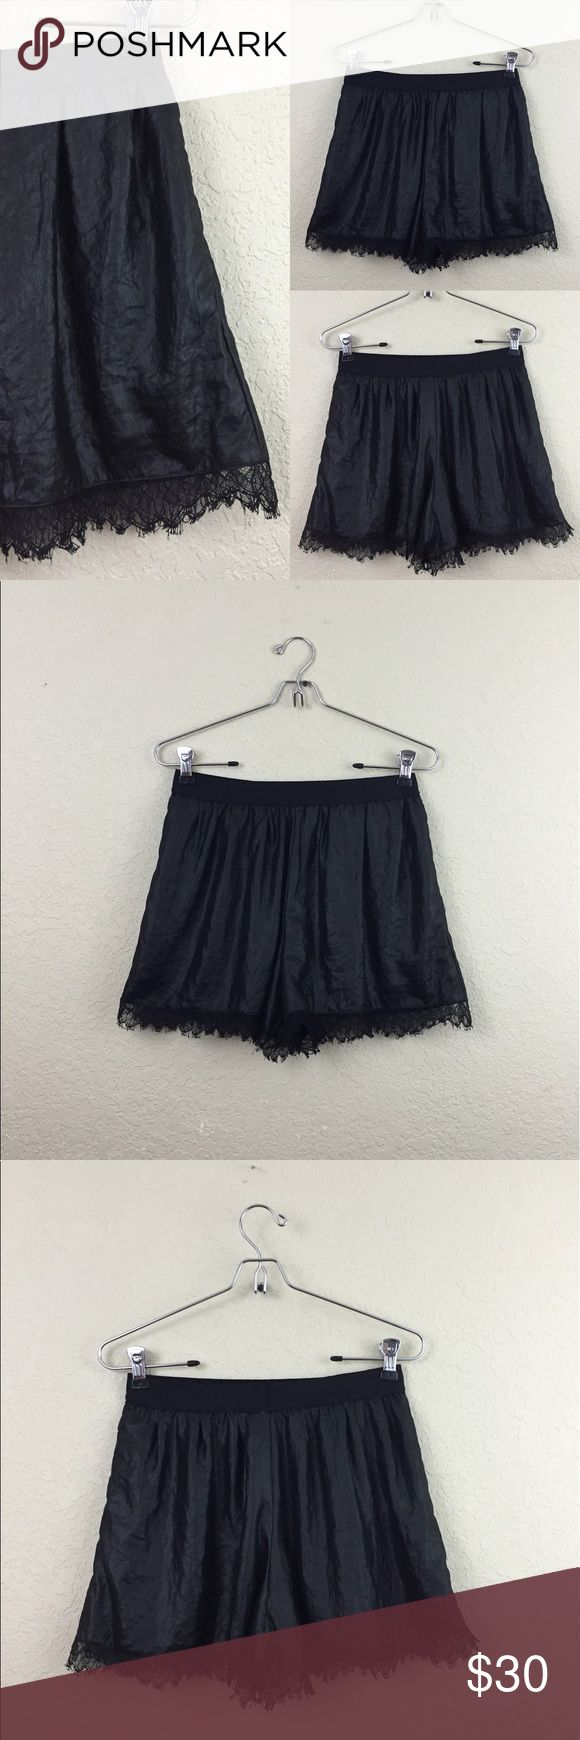 "Bcbgmaxazria lace shorts •Bcbgmaxazria   •lace hem shorts •no damages •size XS   •• total length 13"" stretch waistband BCBGMaxAzria Shorts"